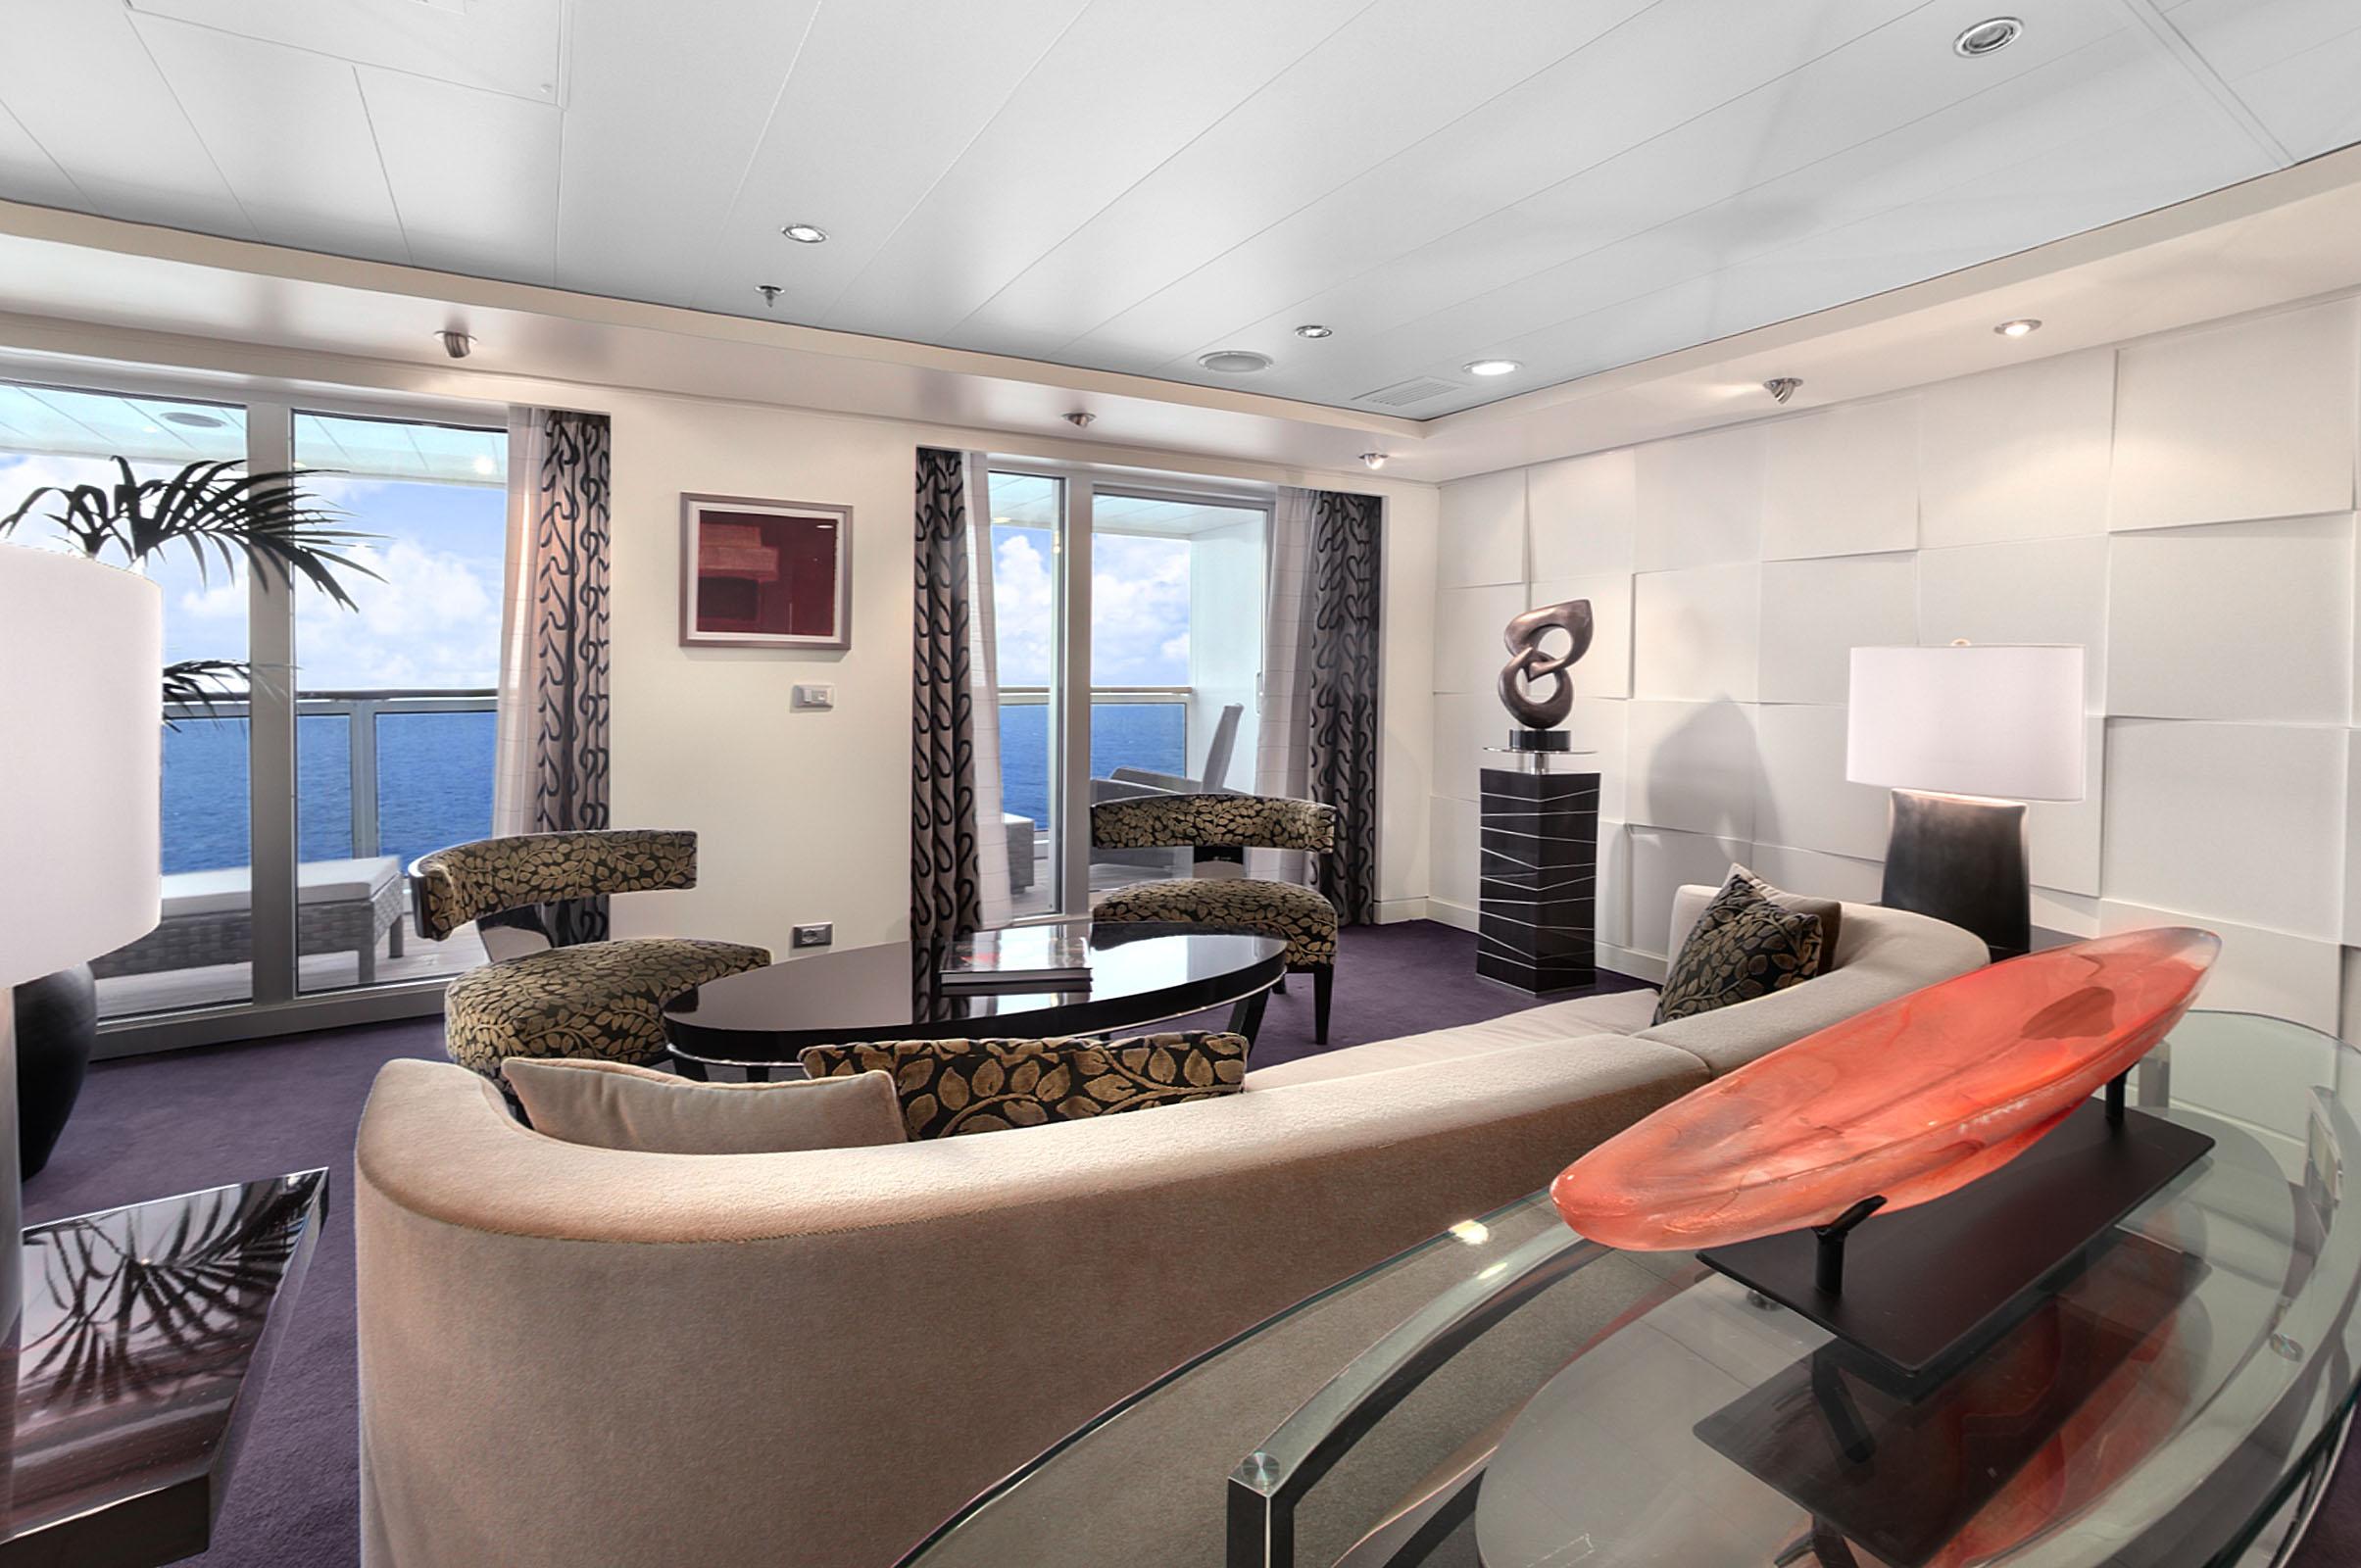 Oceania Cruises Oceania Class Accommodation Oceania Suite Living Room.jpg